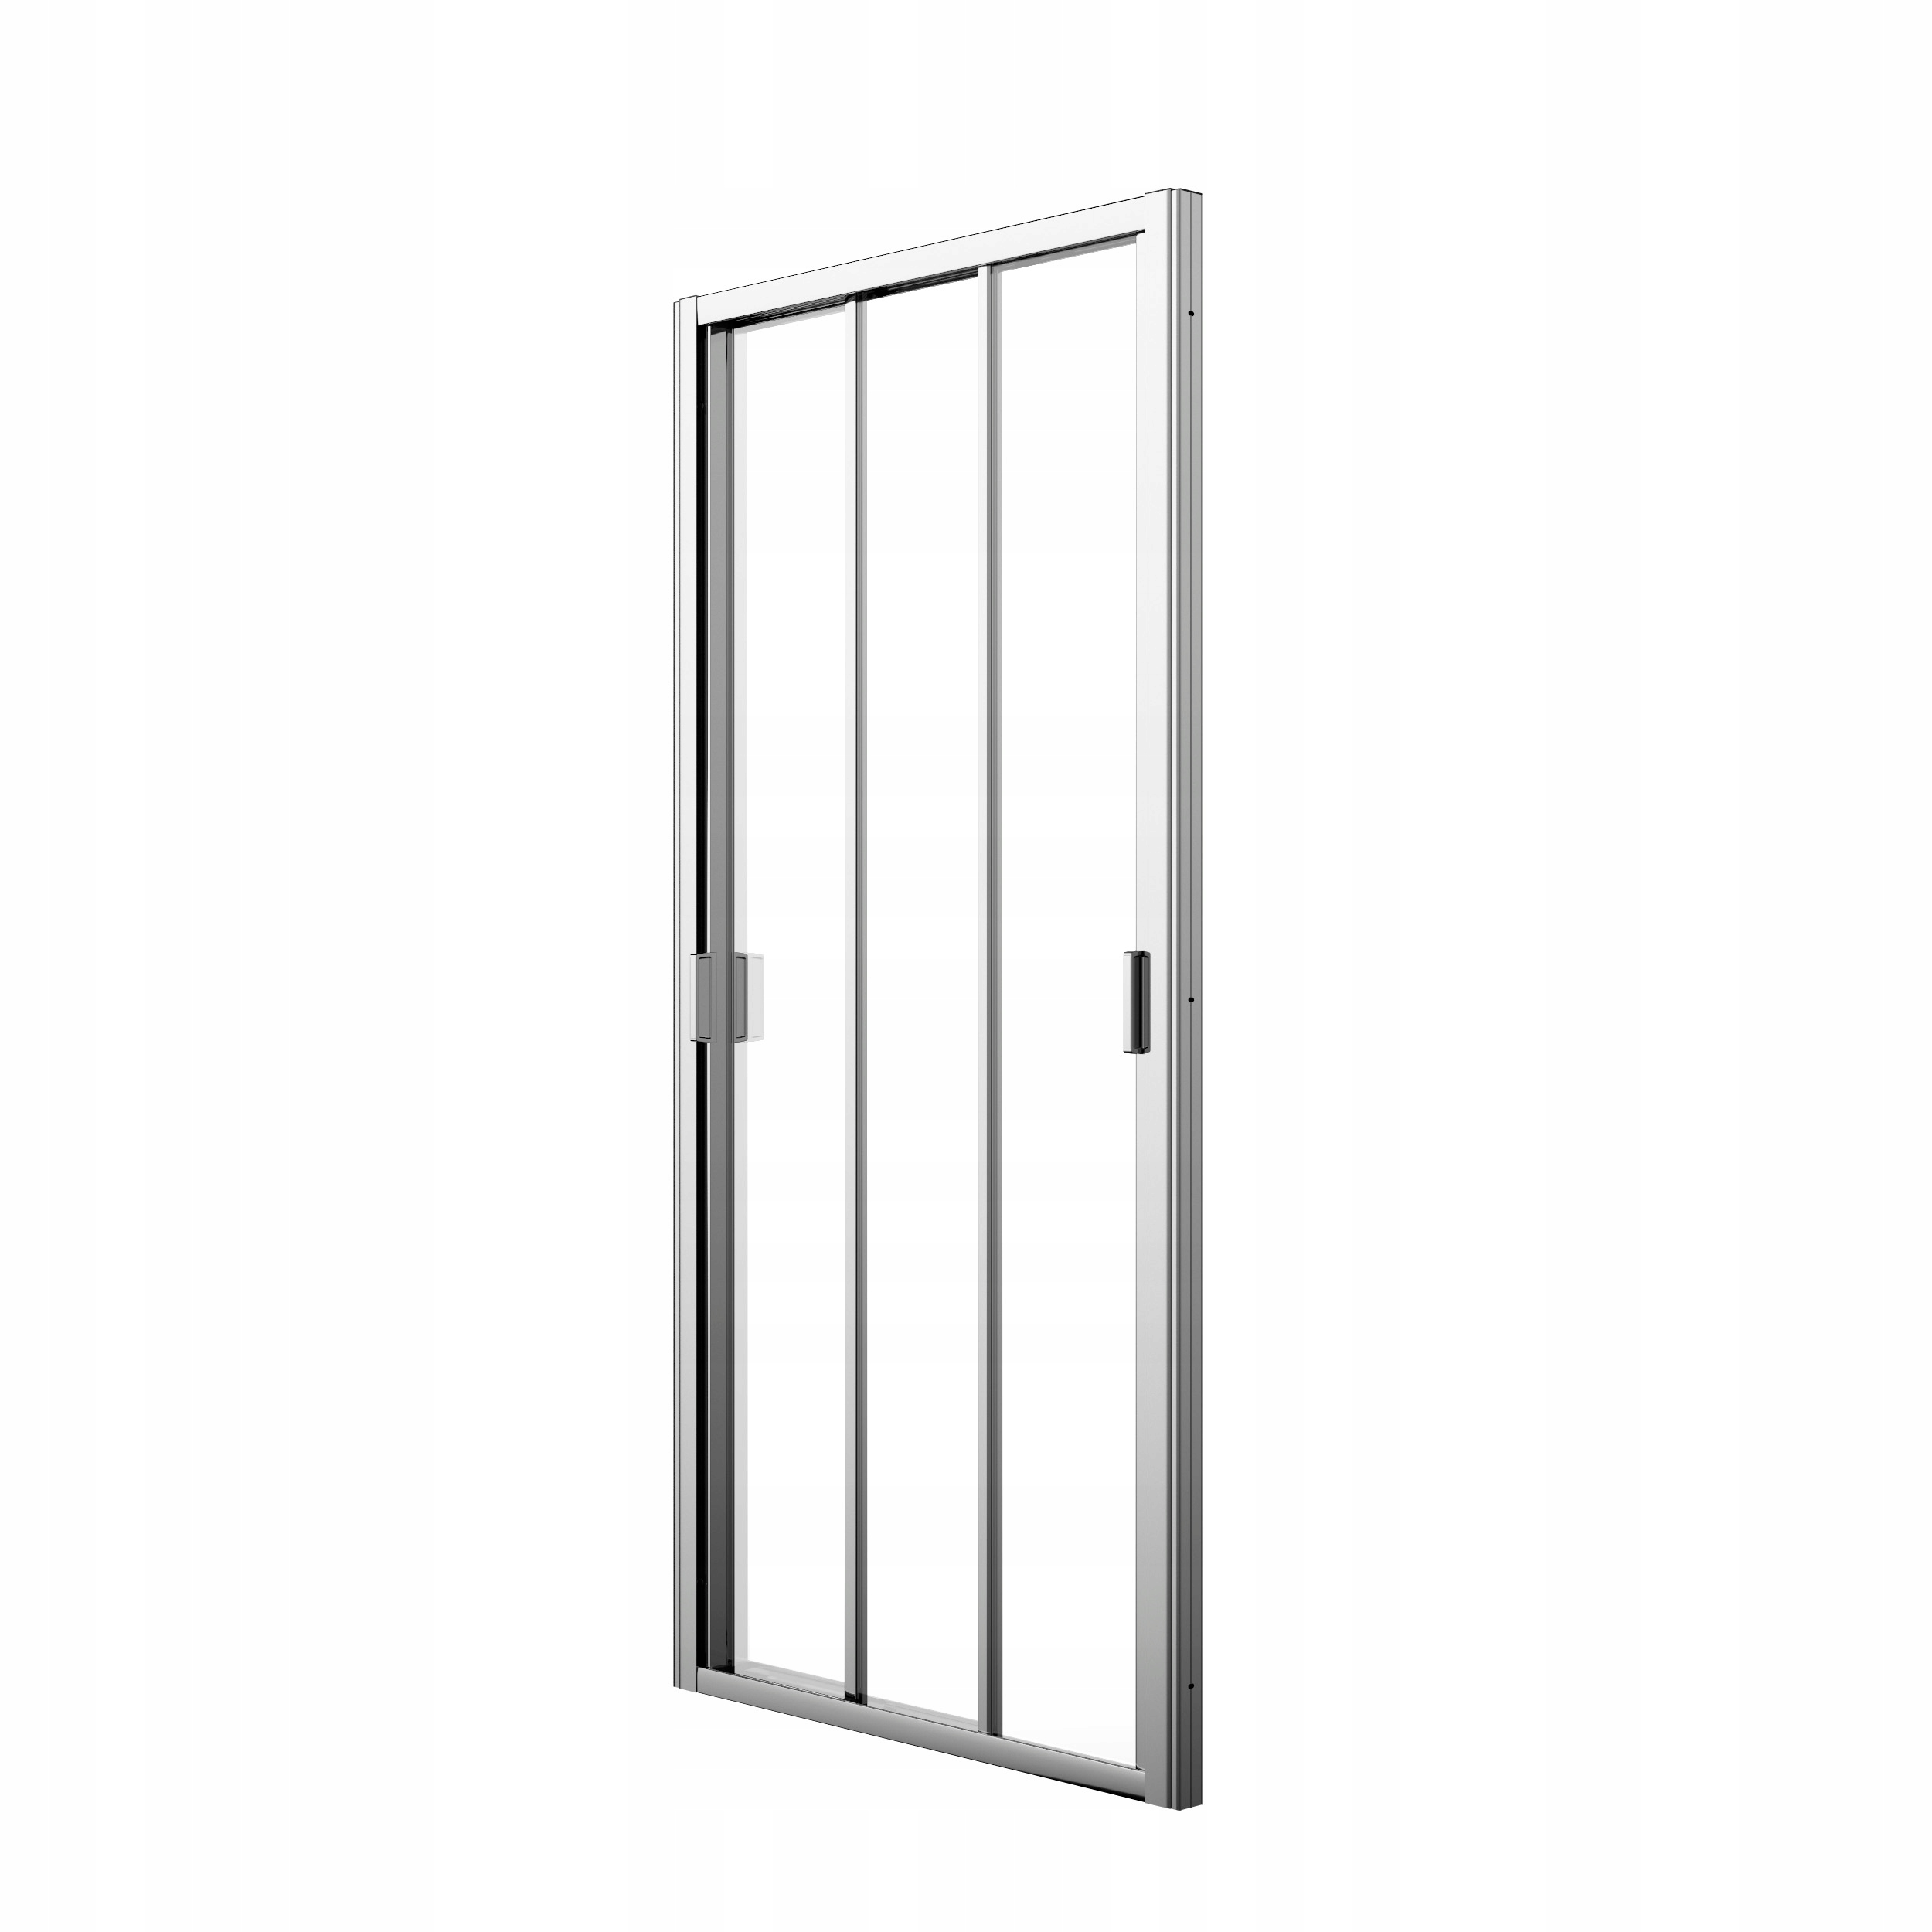 Sprchové dvere EVO DW 75x200 cm RADAWAY